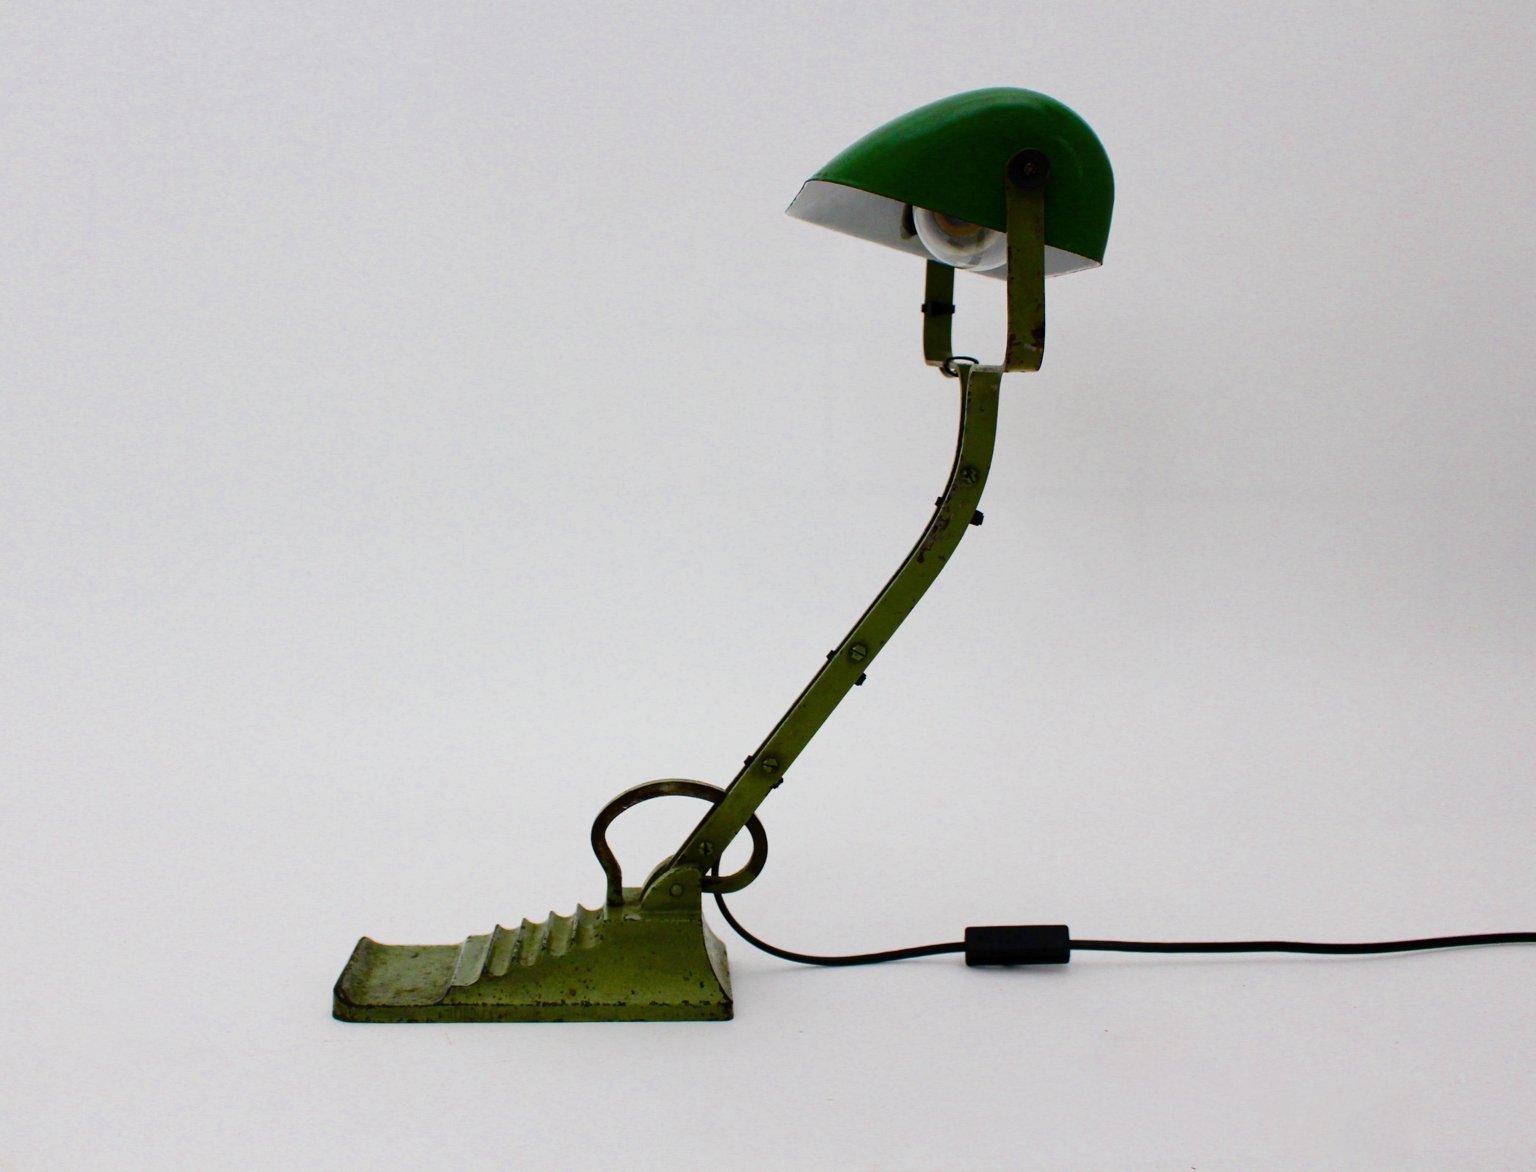 Bauhaus Green Glass Desk Lamp, 1920s for sale at Pamono